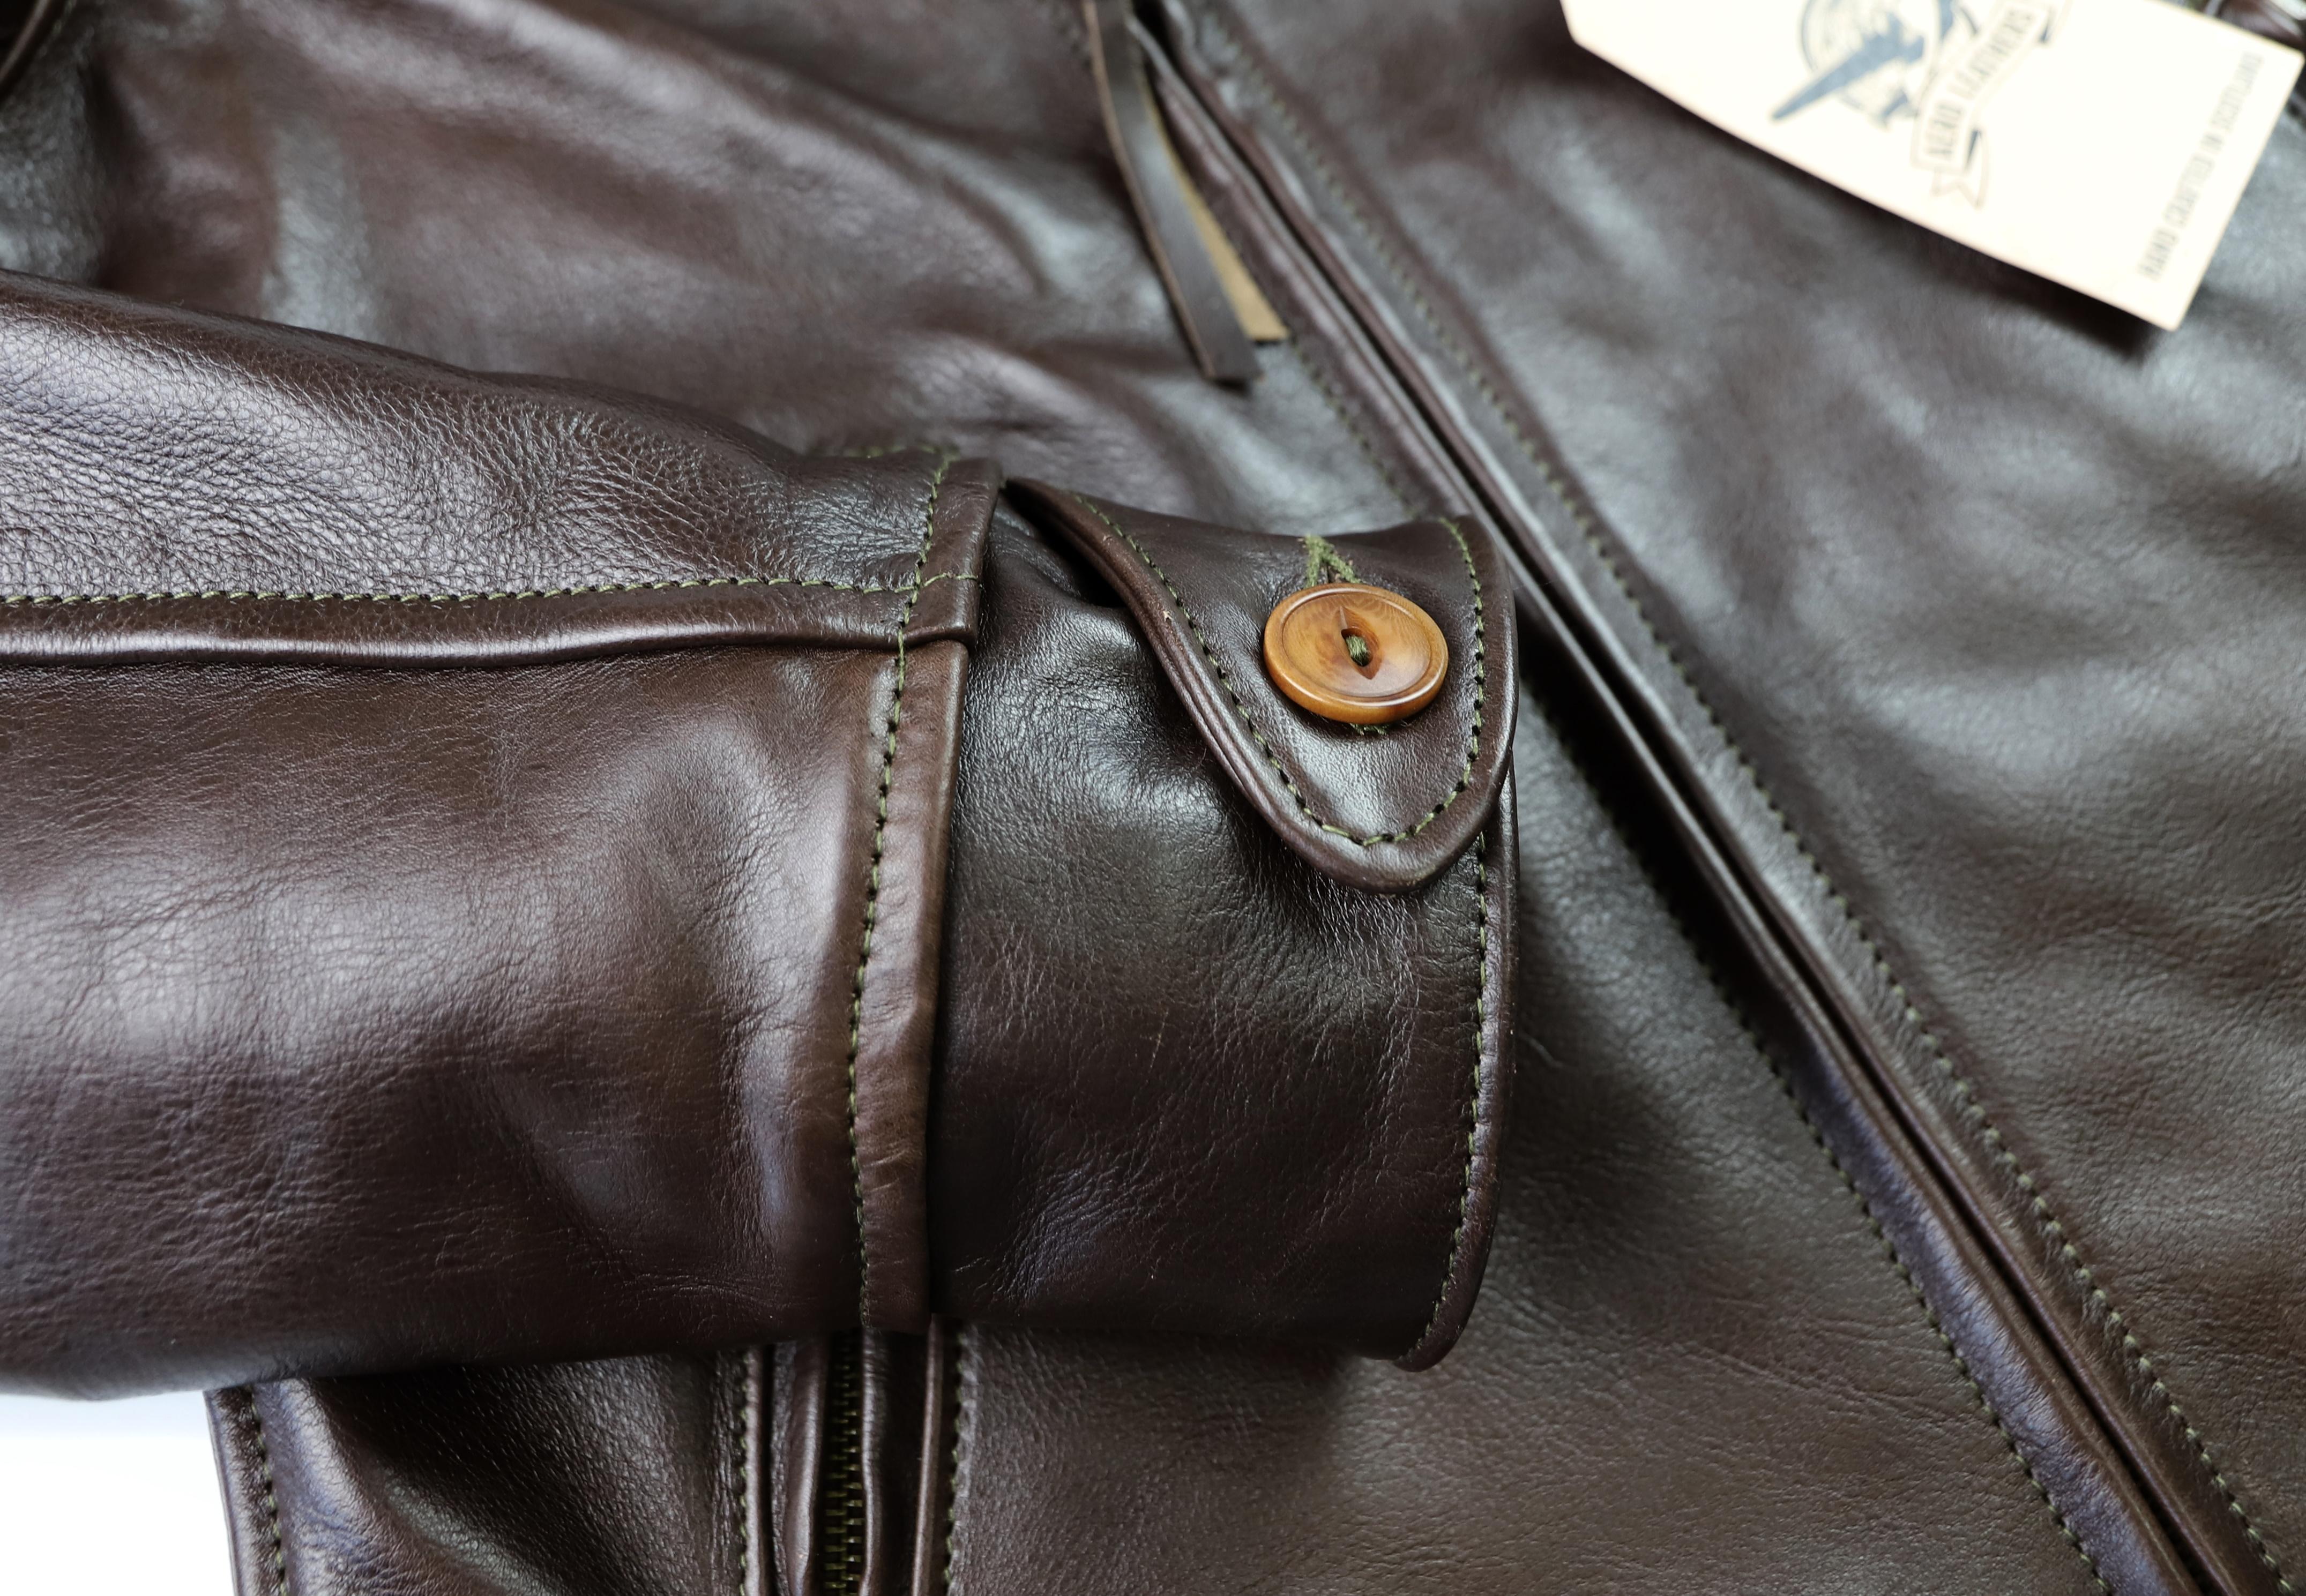 Aero Hooch Hauler Dark Seal Vicenza Horsehide ALW1 button cuff.jpg